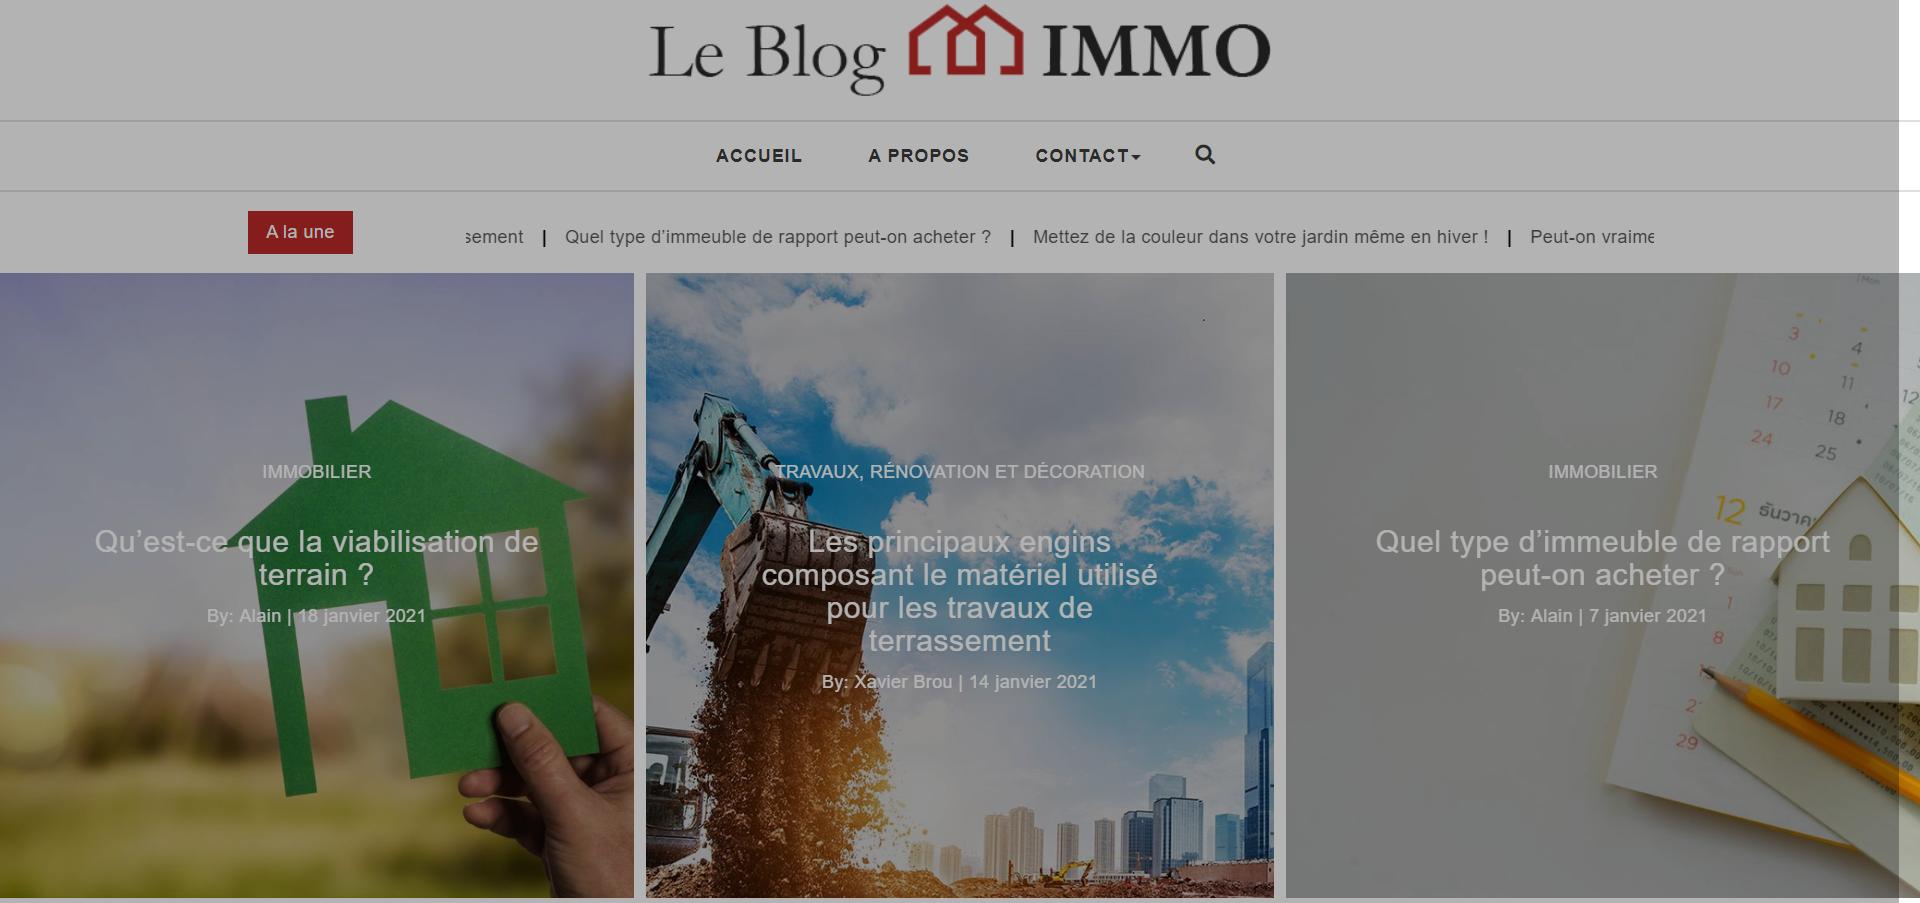 impression-ecran-page-accueil-le-blog-immo